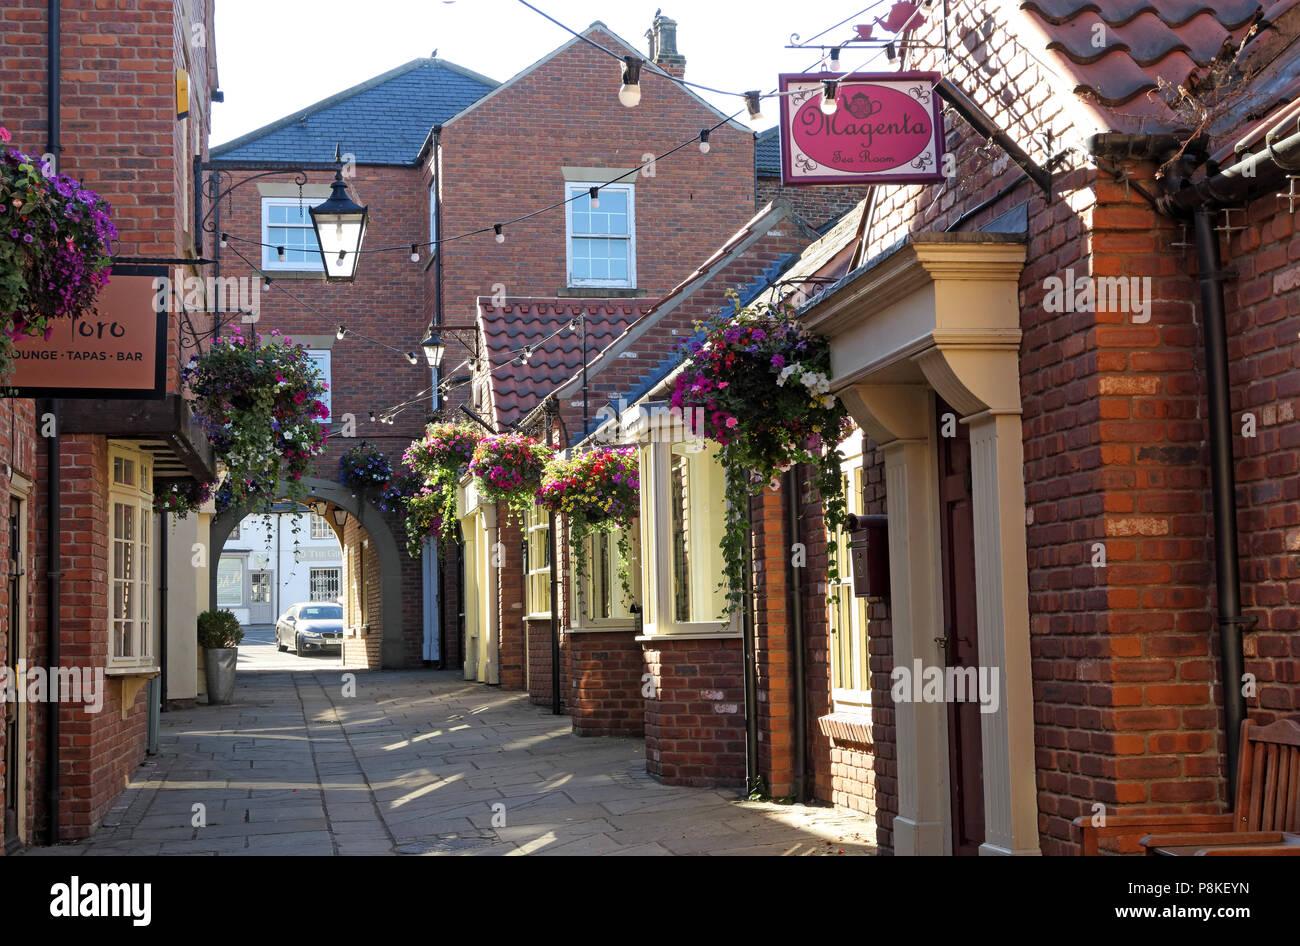 Dieses Stockfoto: Casual Einkaufsstraße in Lerwick, Doncaster, South Yorkshire, England, Großbritannien - P8KEYN